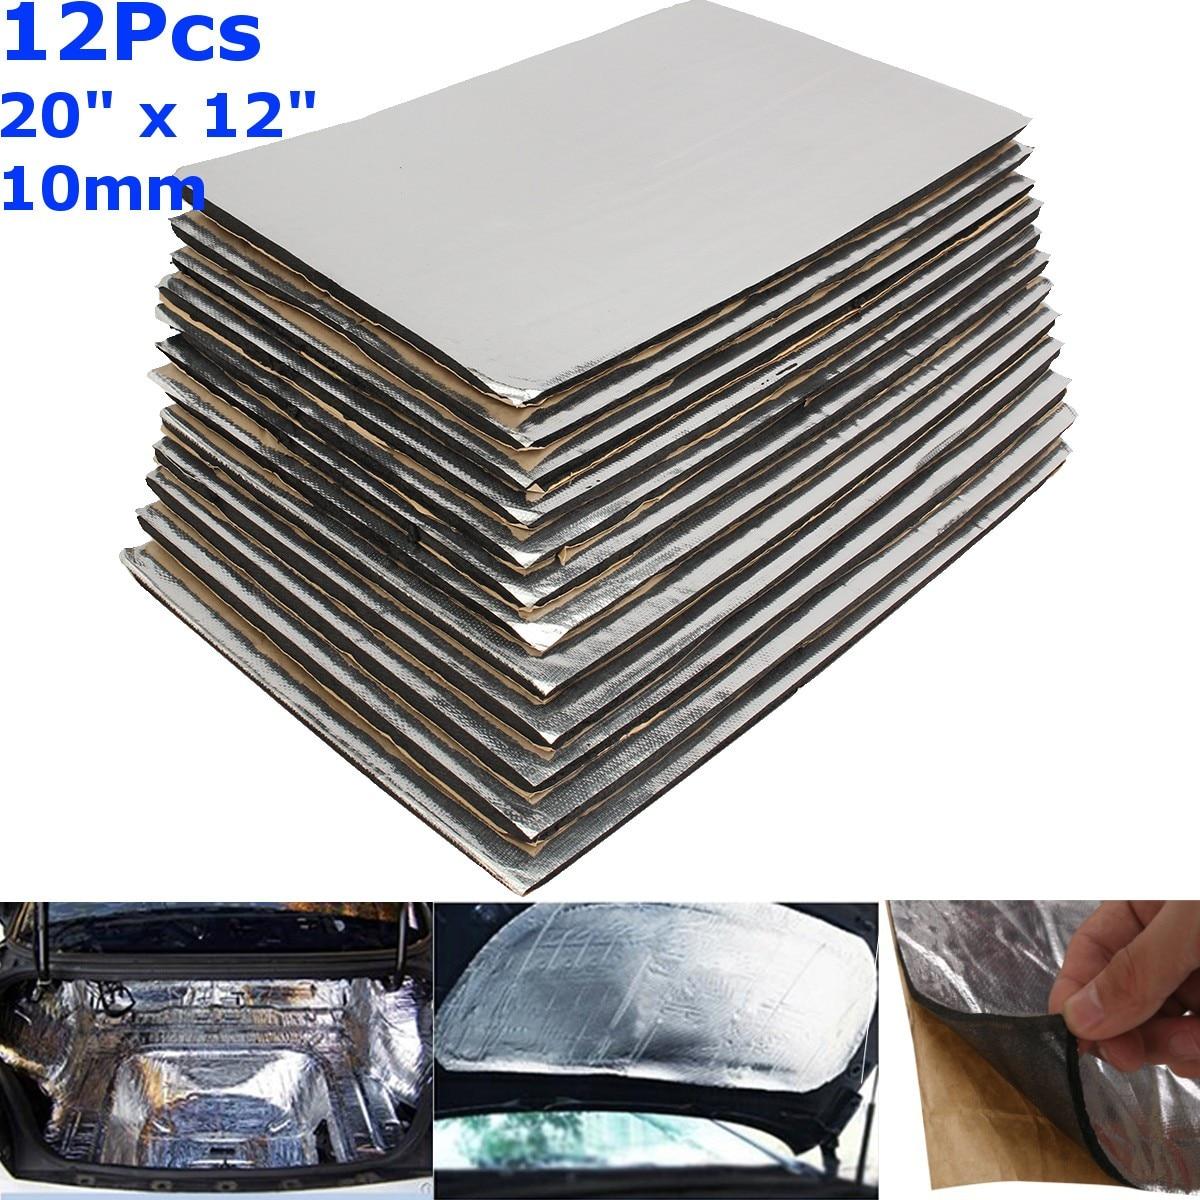 9 pz/12 pz 10mm 8mm 6mm auto fonoassorbente fonoassorbente isolamento acustico isolamento acustico tappetino cappuccio schiuma a celle chiuse 50x30cm